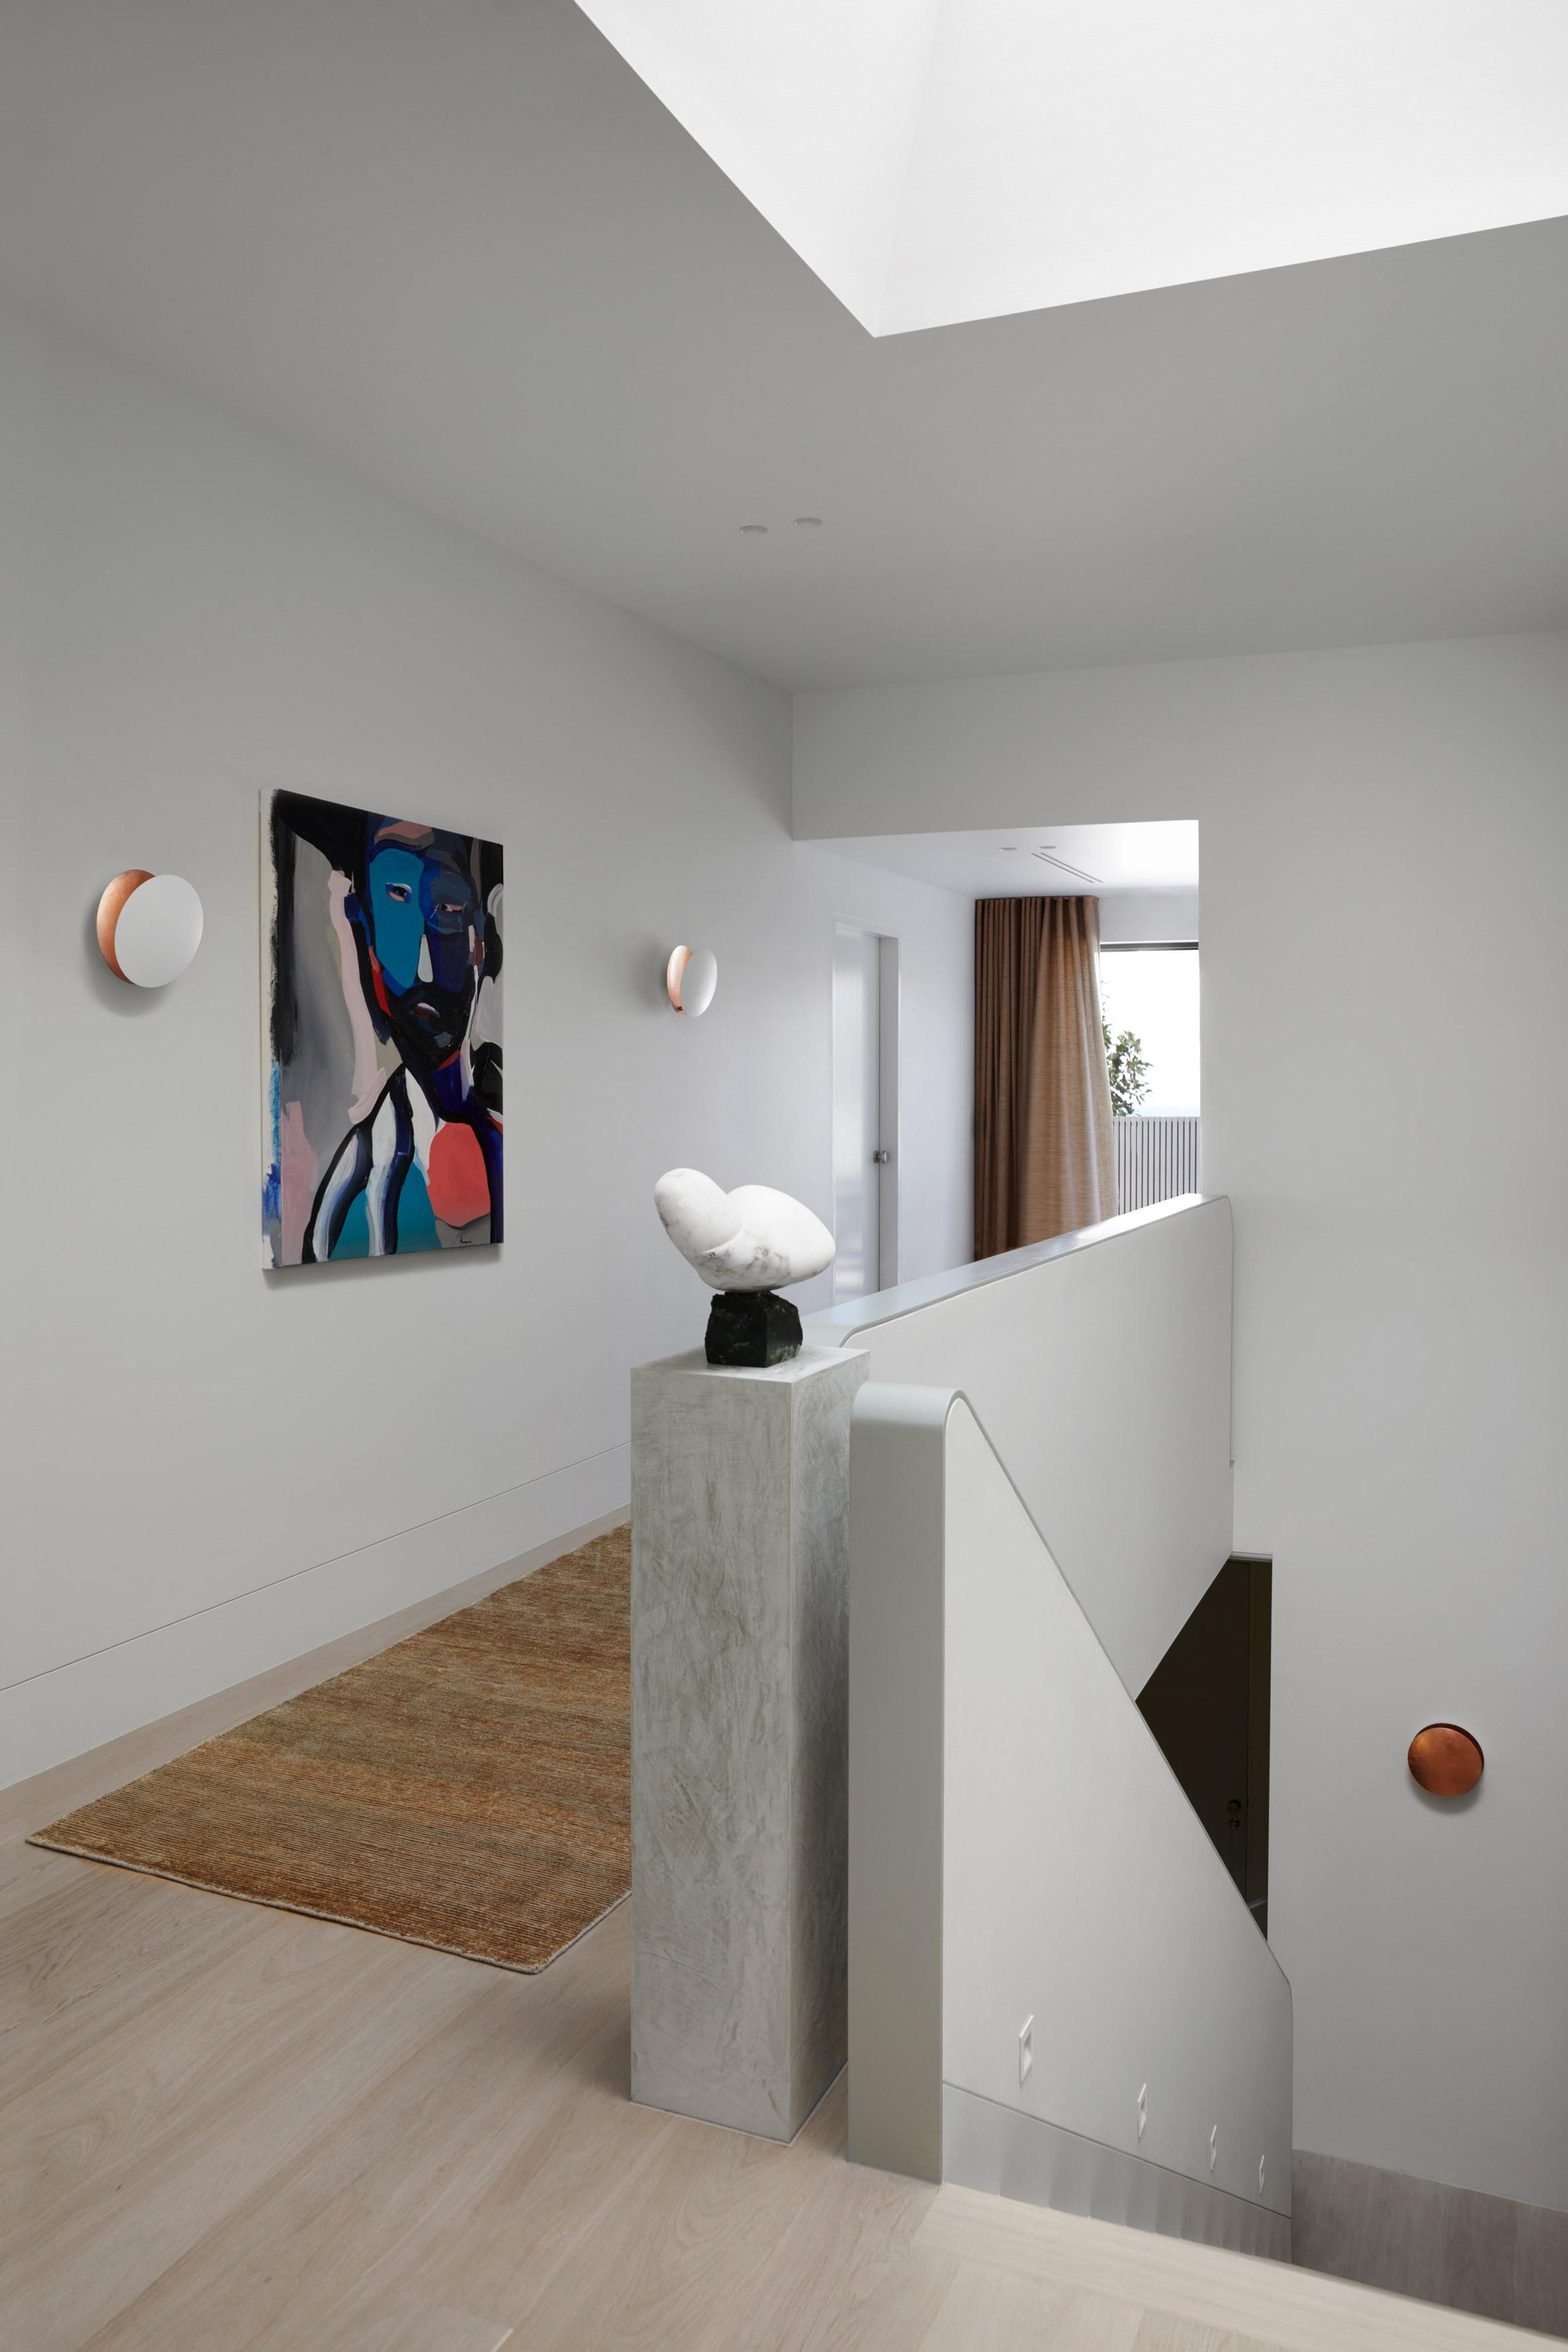 Balmoral Blue House by Esoteriko